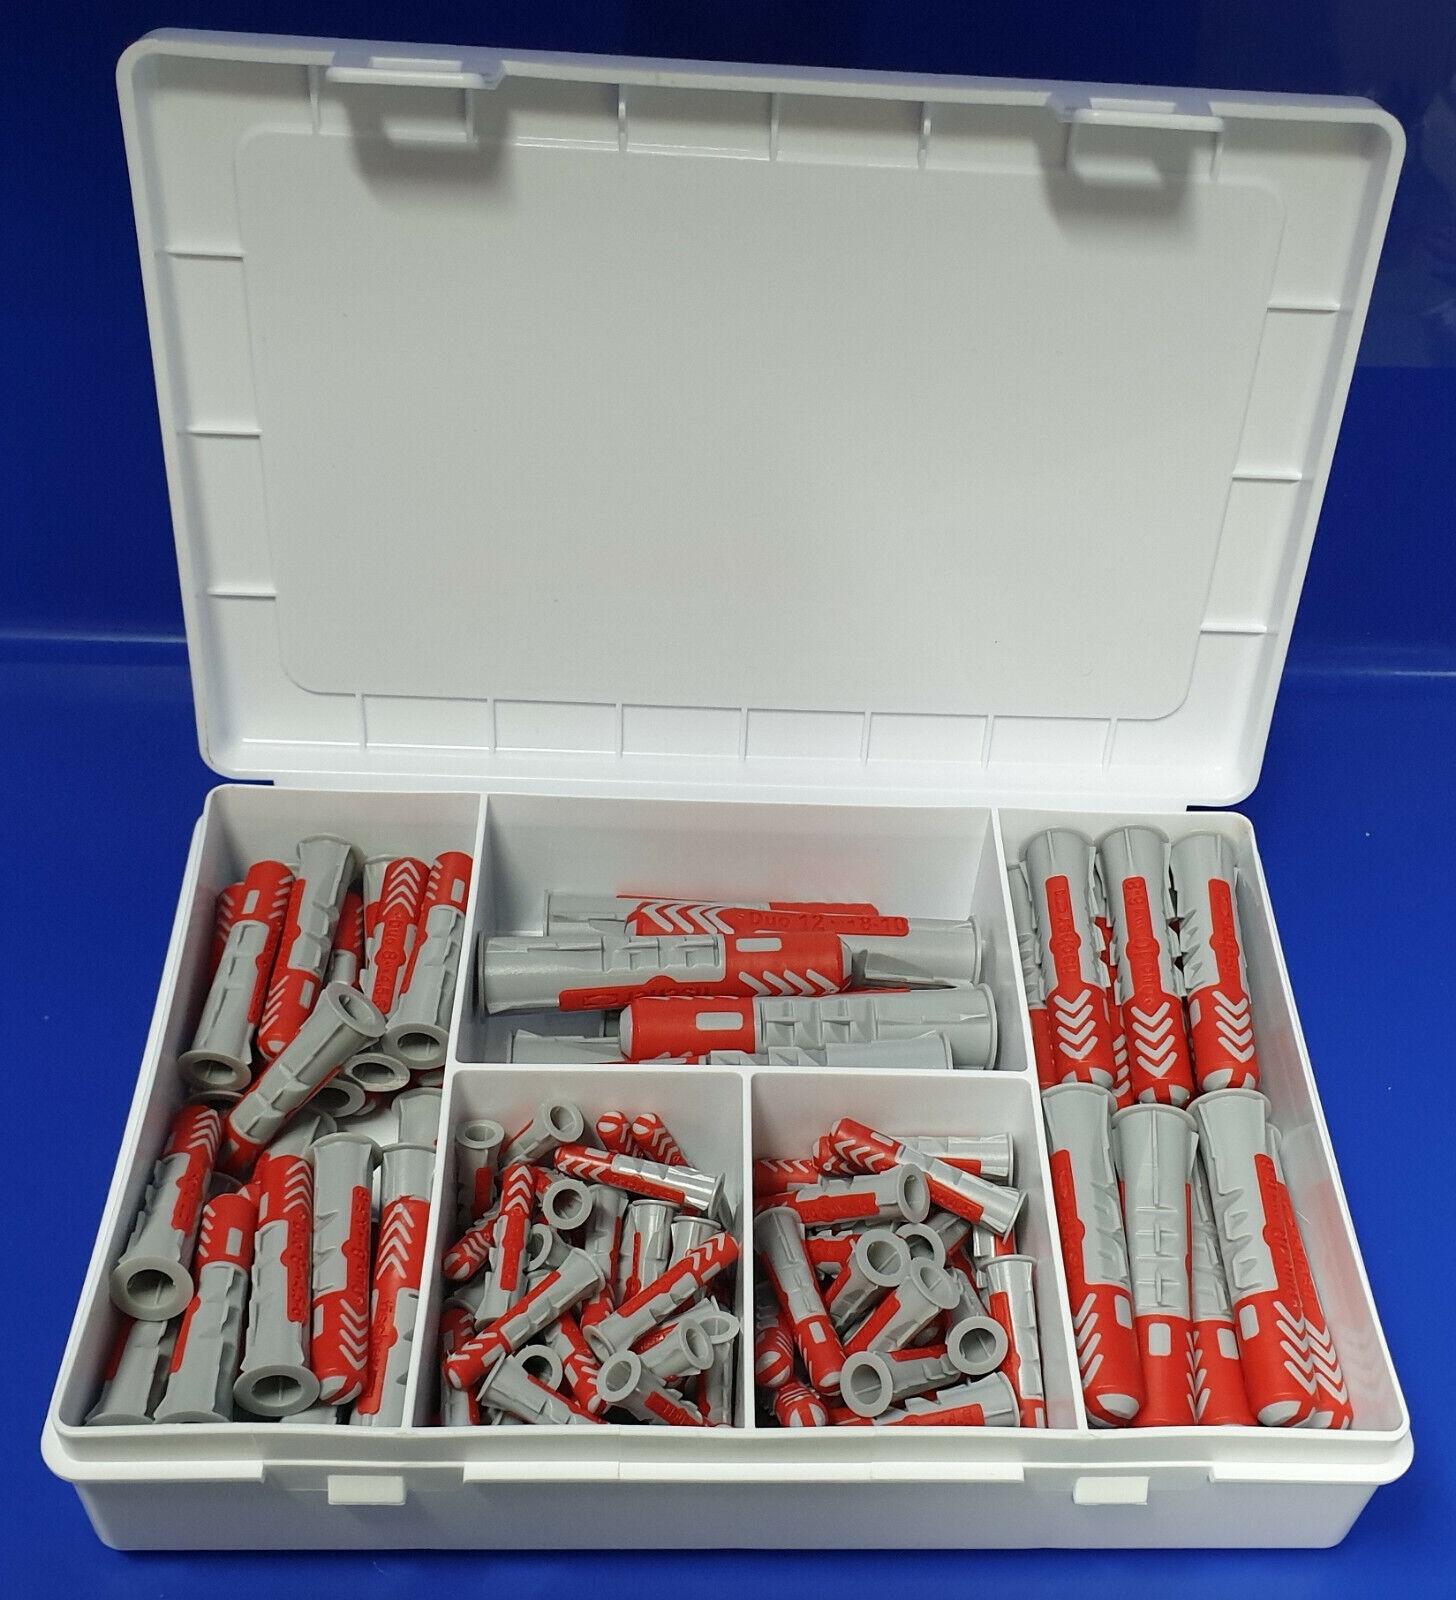 Fischer Dübel Schrauben Sortiment 220 Teile FIXtainer SX-Dübel-Box L-boxx mini